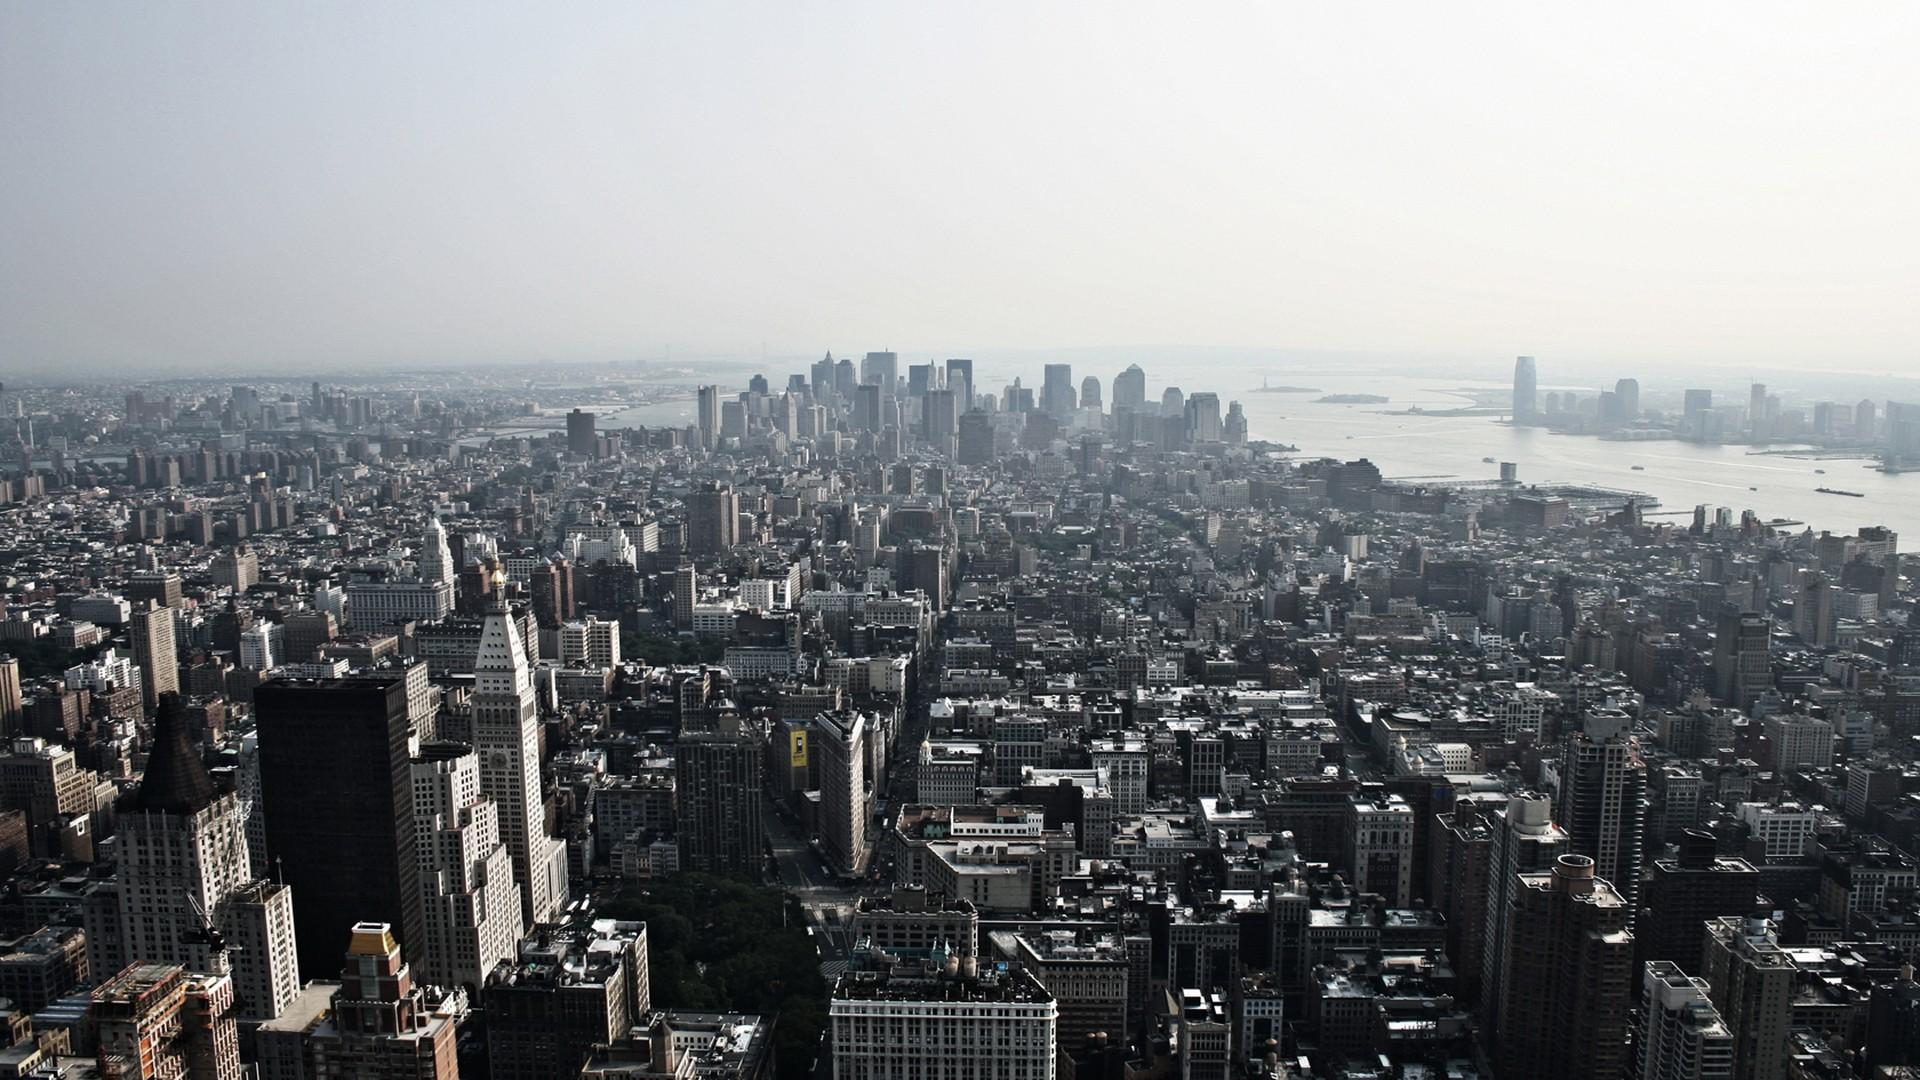 city skyline wallpaper 03 1920x1080